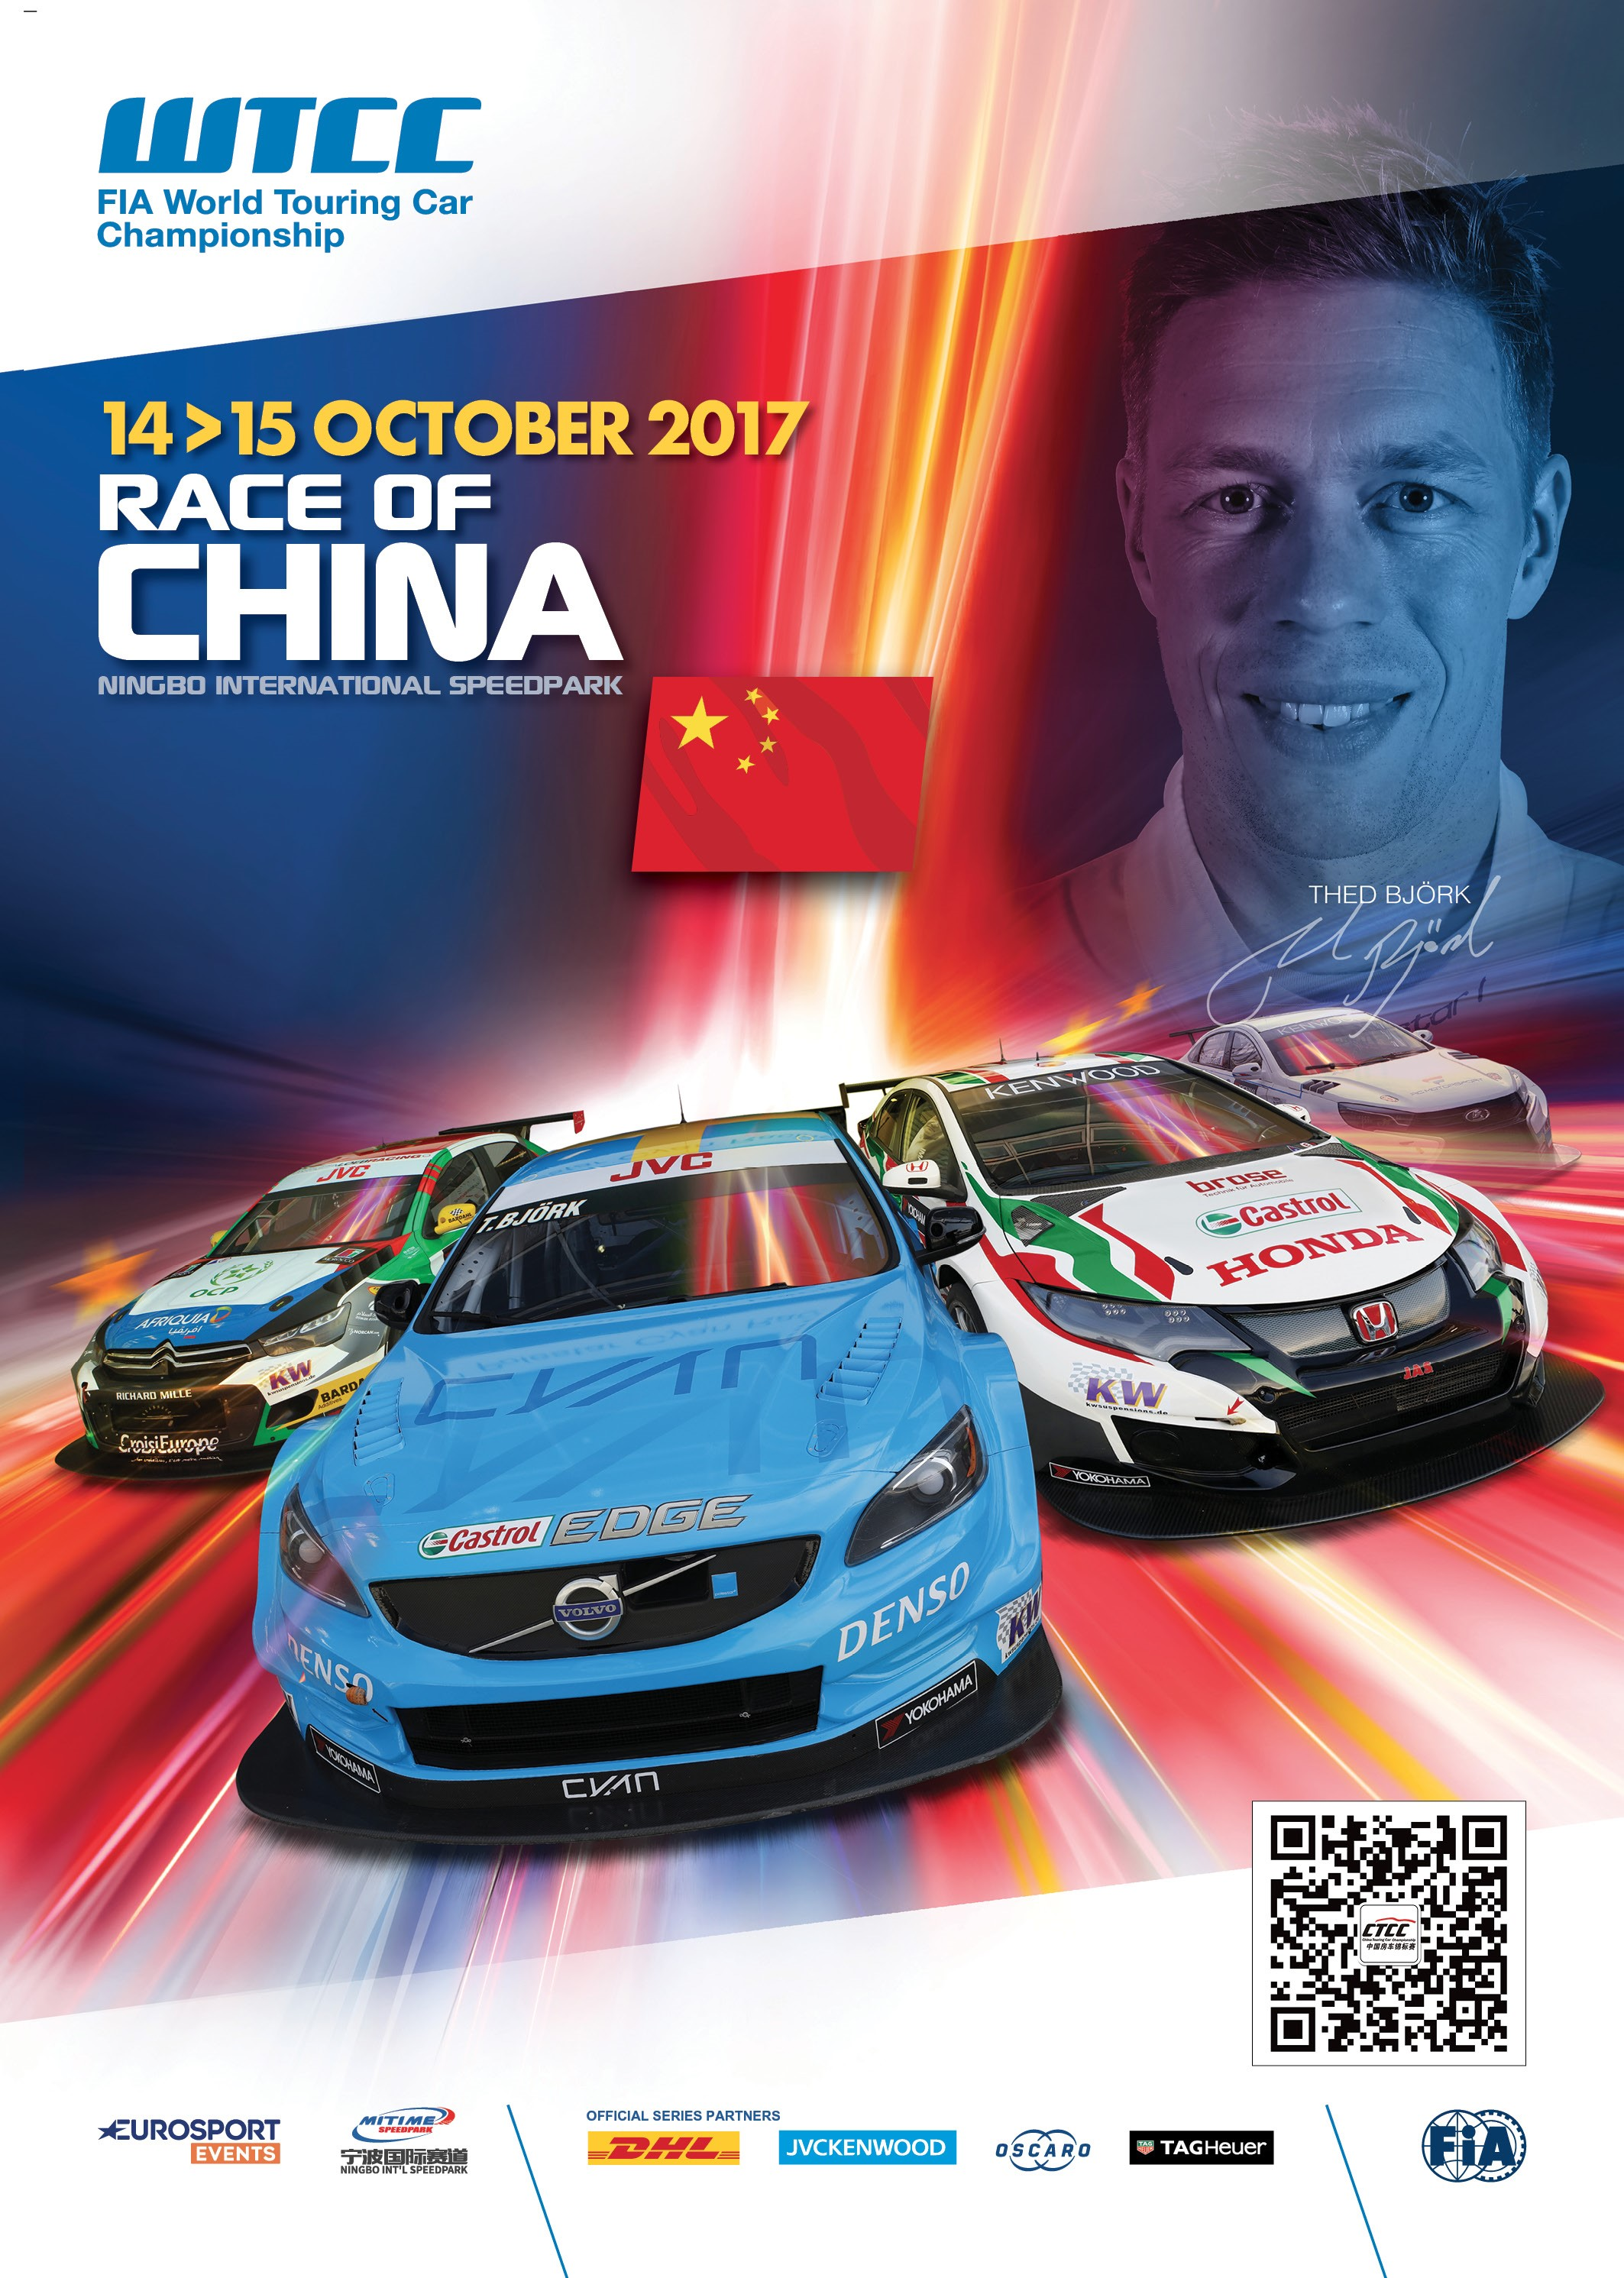 WTCC in China